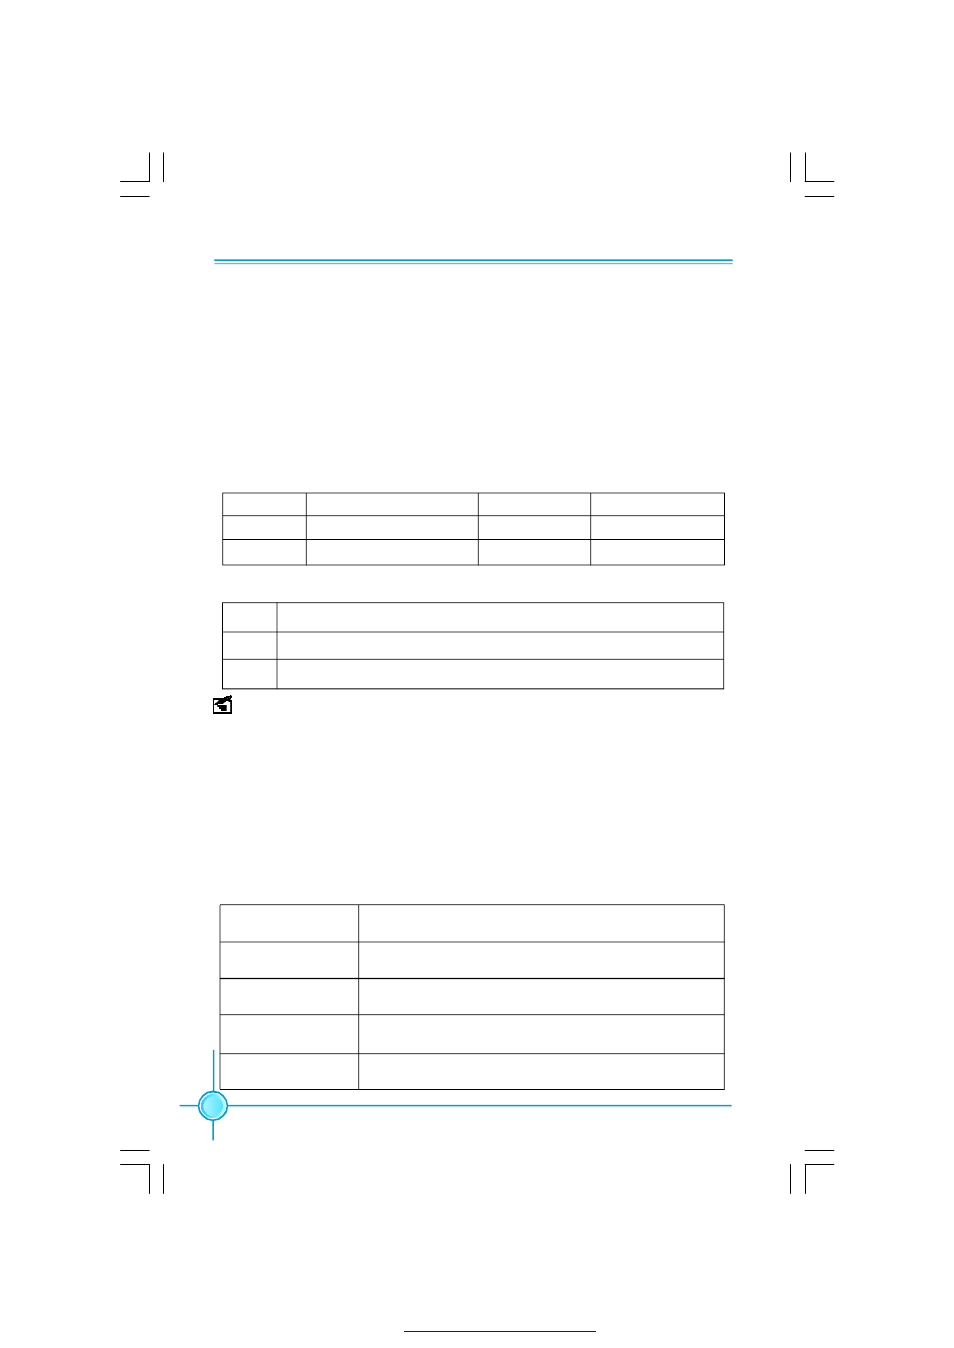 Foxconn 45cmx User Manual Daihatsu Yrv Turbo Wiring Diagram Background Image Array Page 28 47 Also For 45gmx V Rh Manualsdir